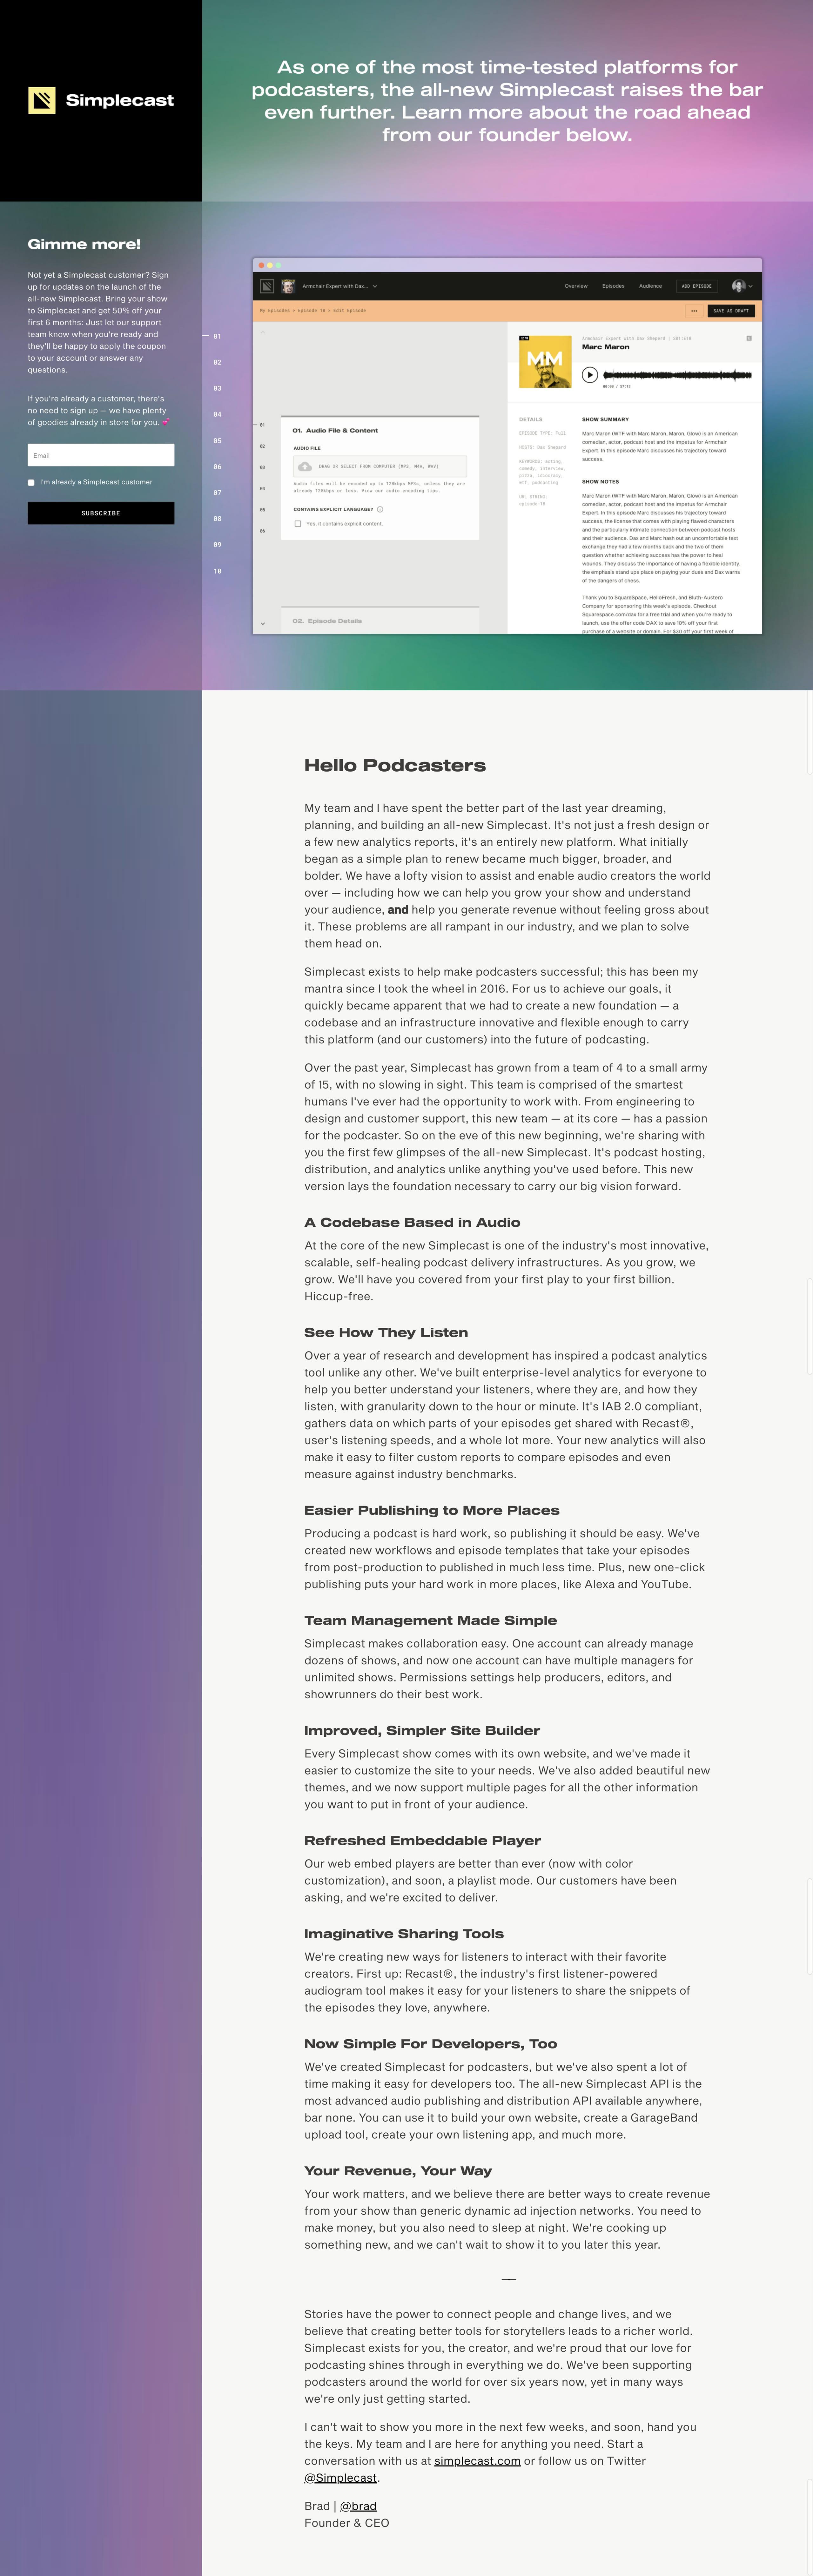 Simplecast 2.0 Website Screenshot